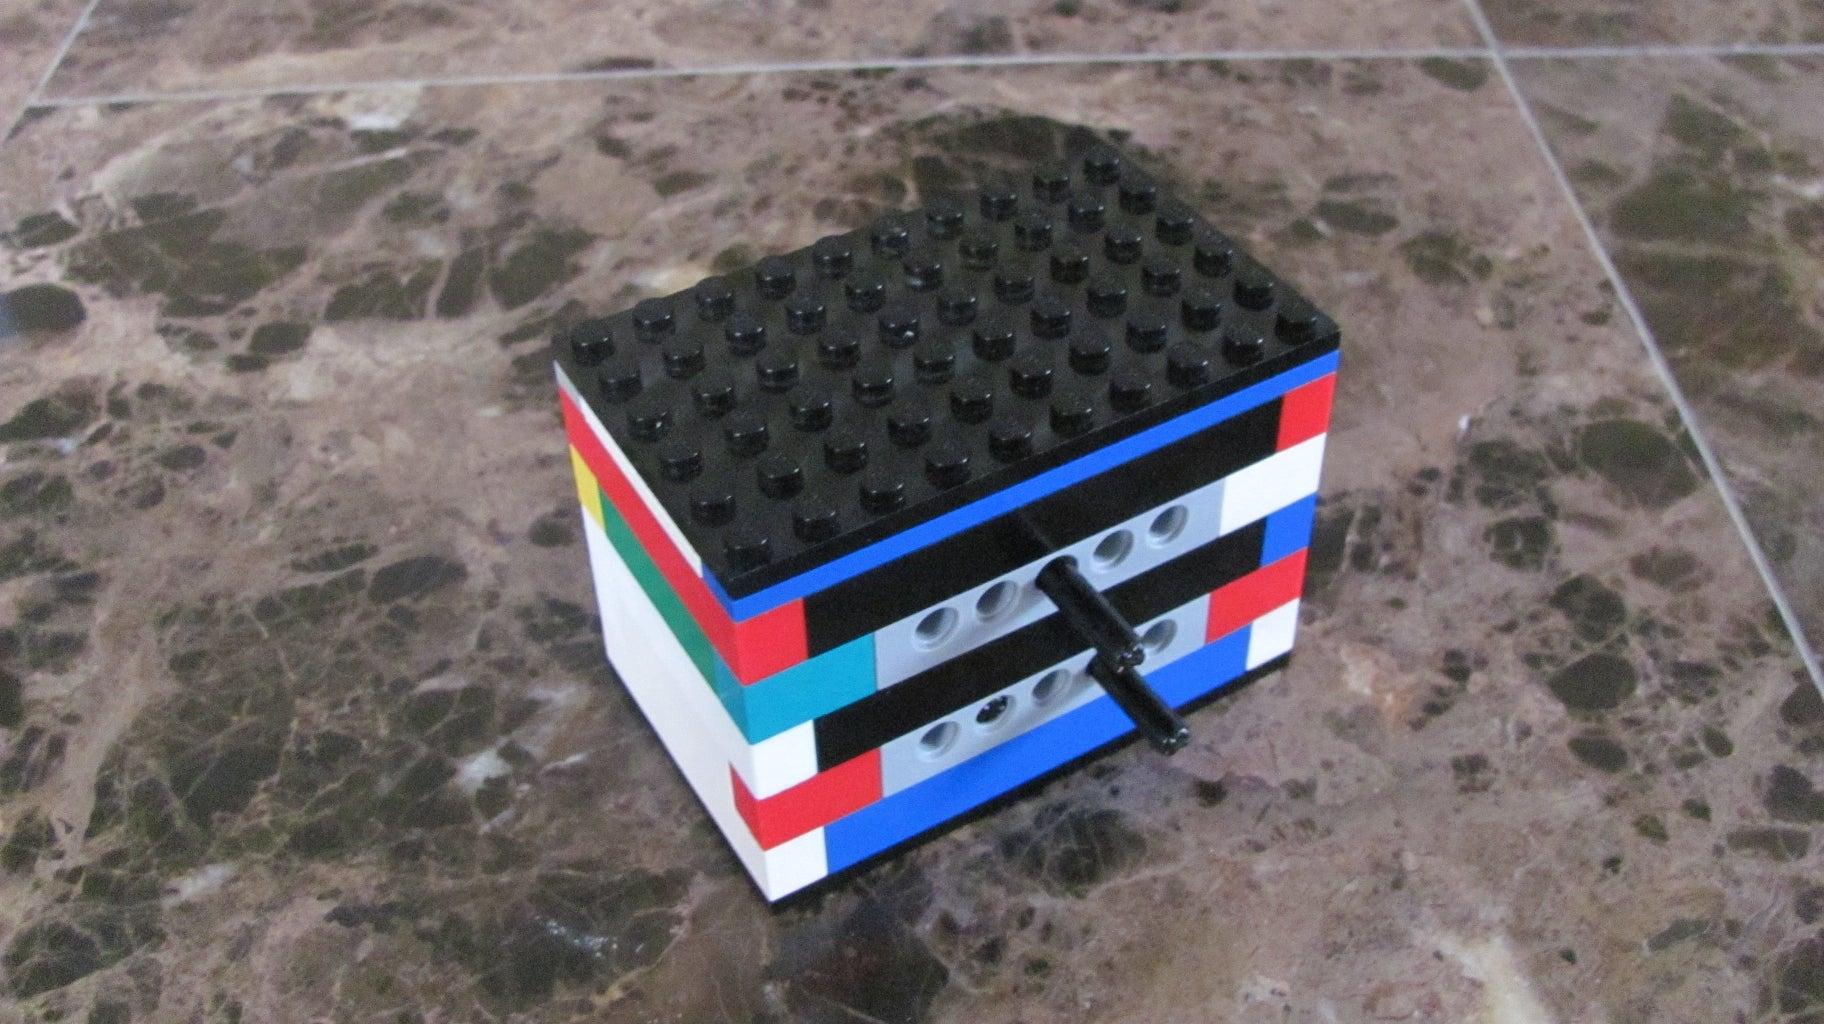 LEGO Technic One-Way Gear Mechanism